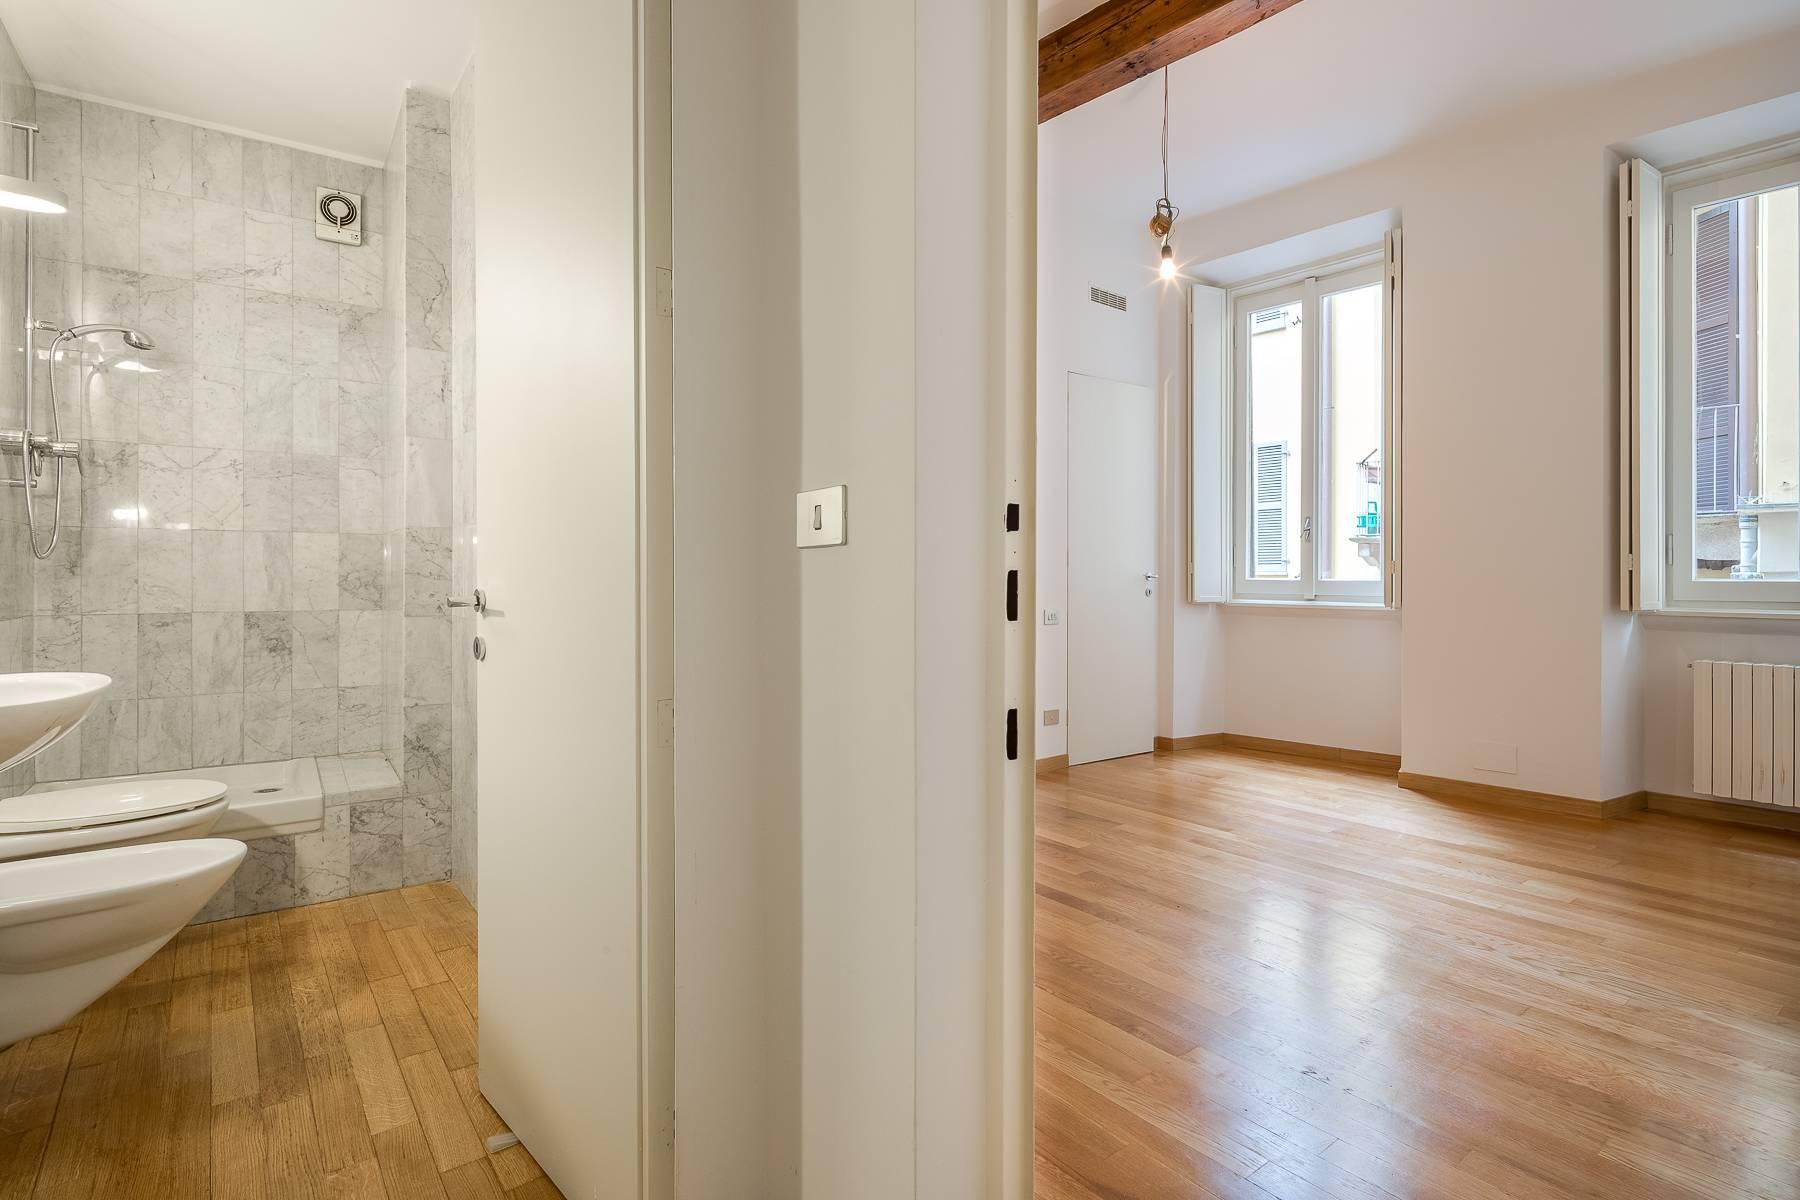 Apartment in an elegant period building located in a prestigious city district - 3